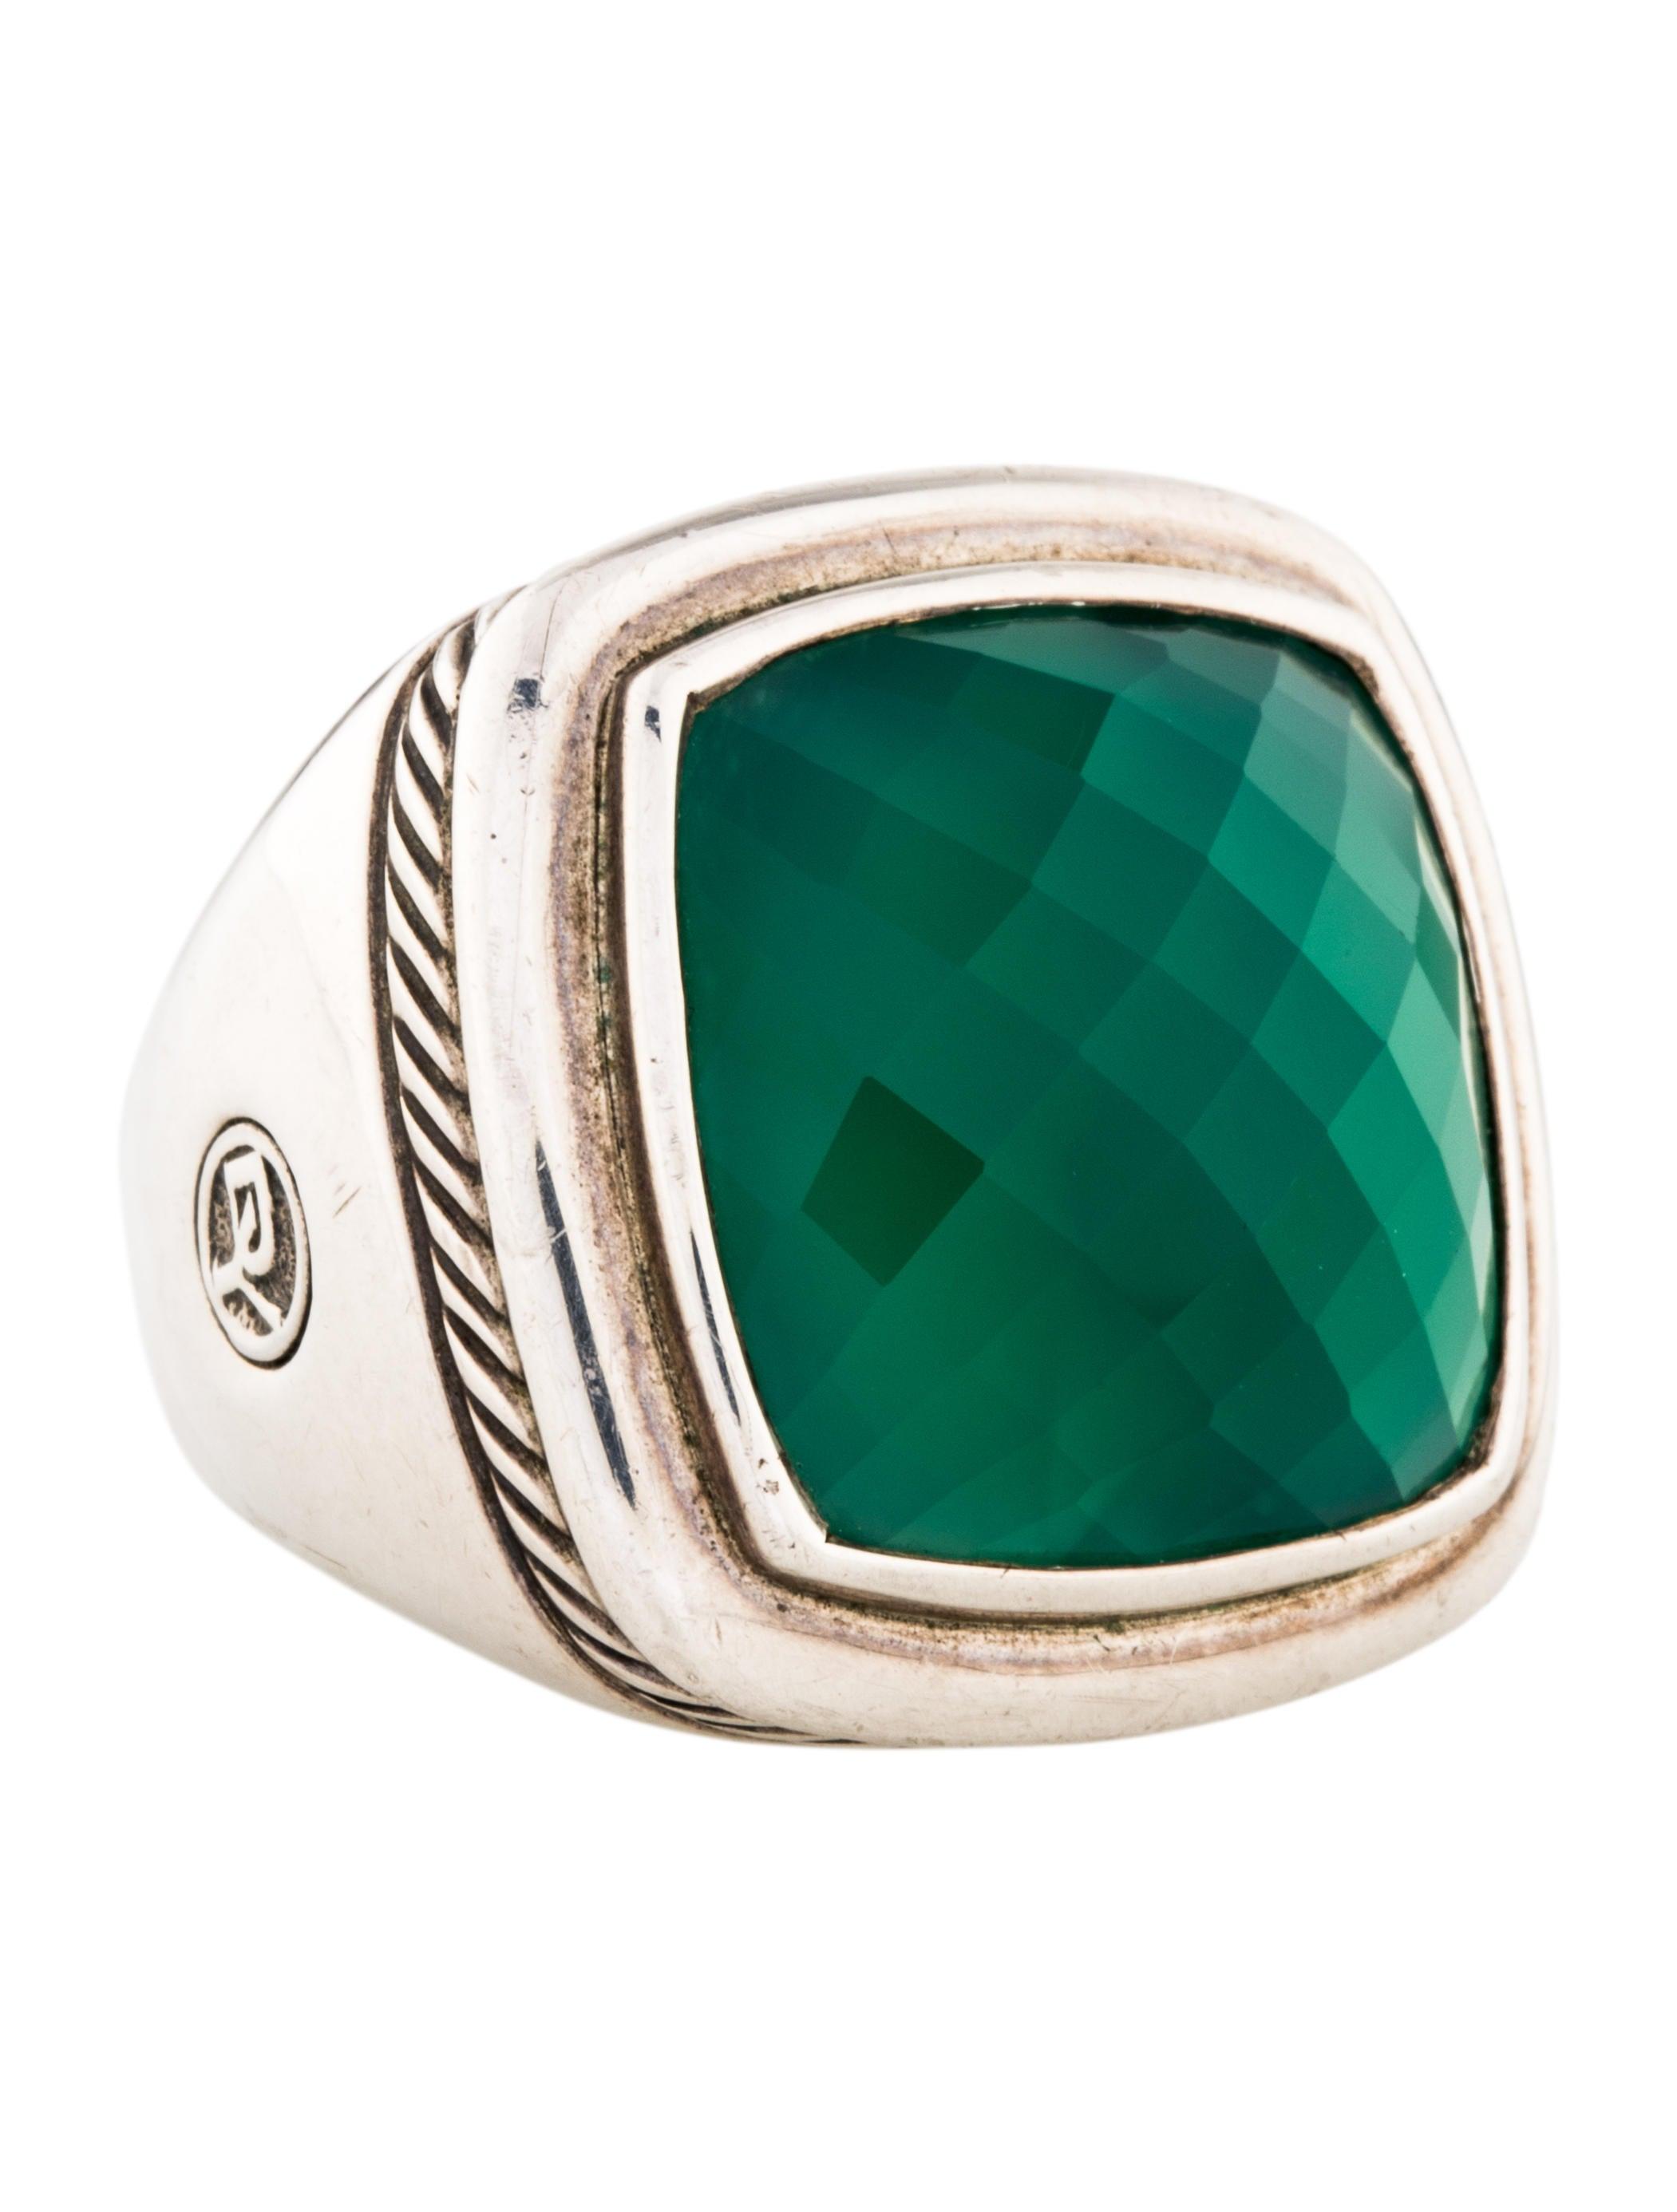 David yurman chalcedony large albion ring rings for David yurman inspired jewelry rings